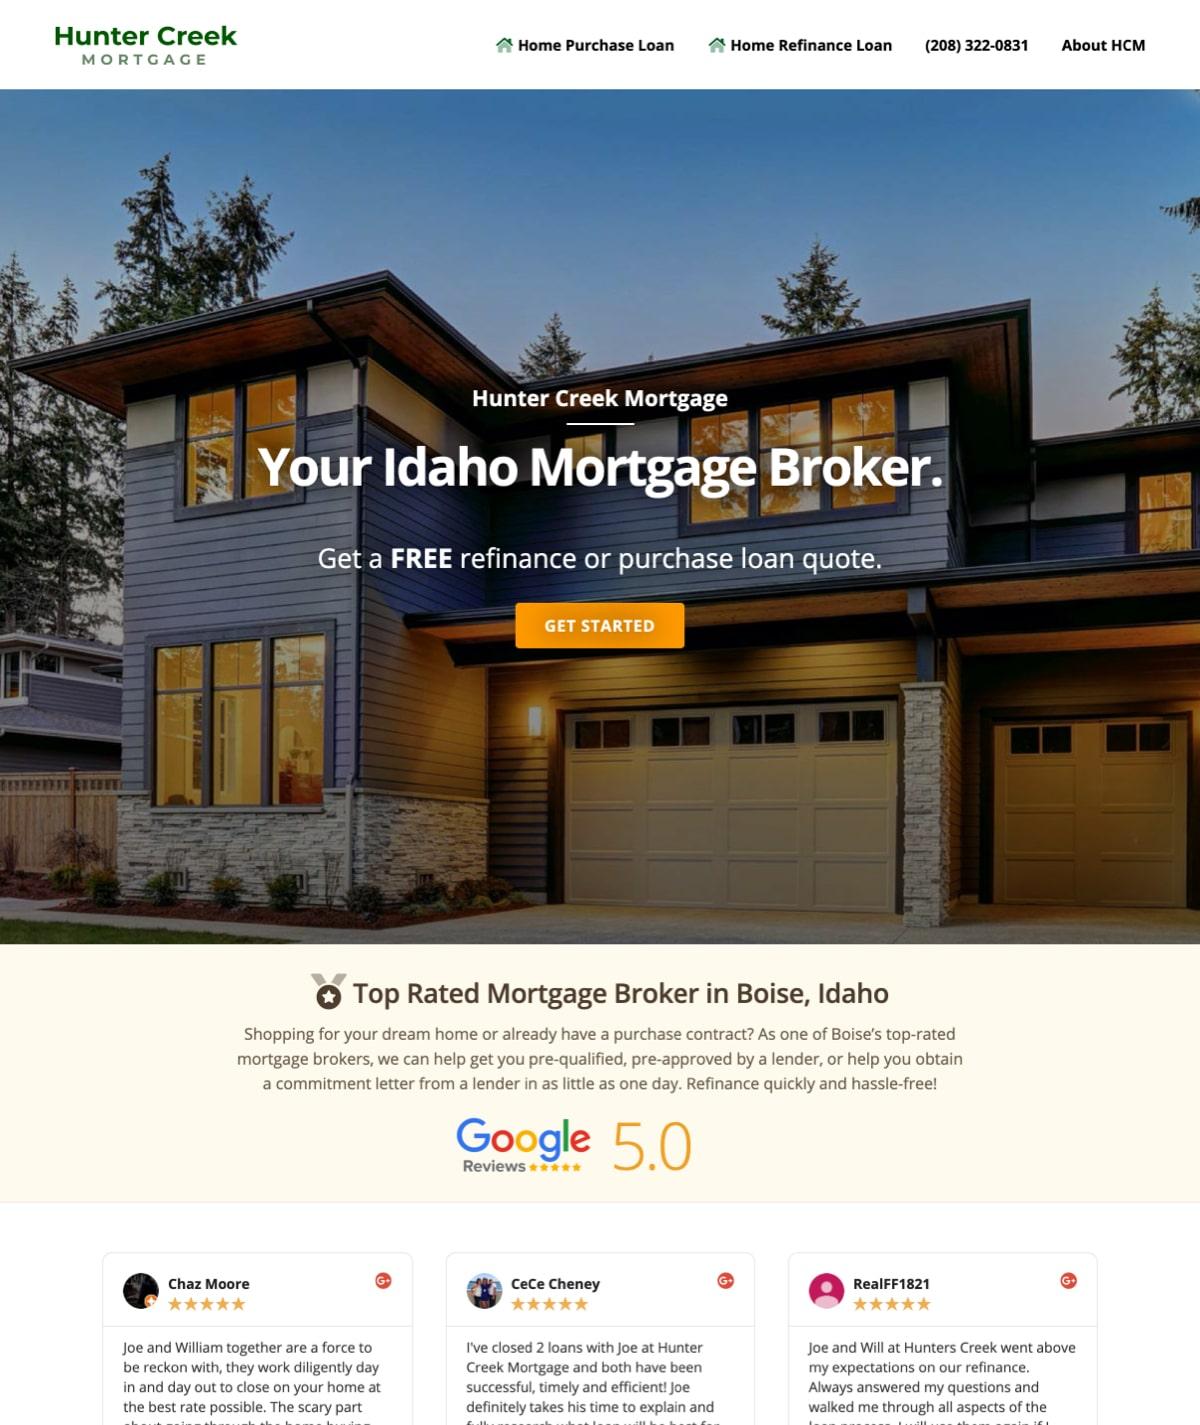 Boise web design - Hunter Creek Mortgage